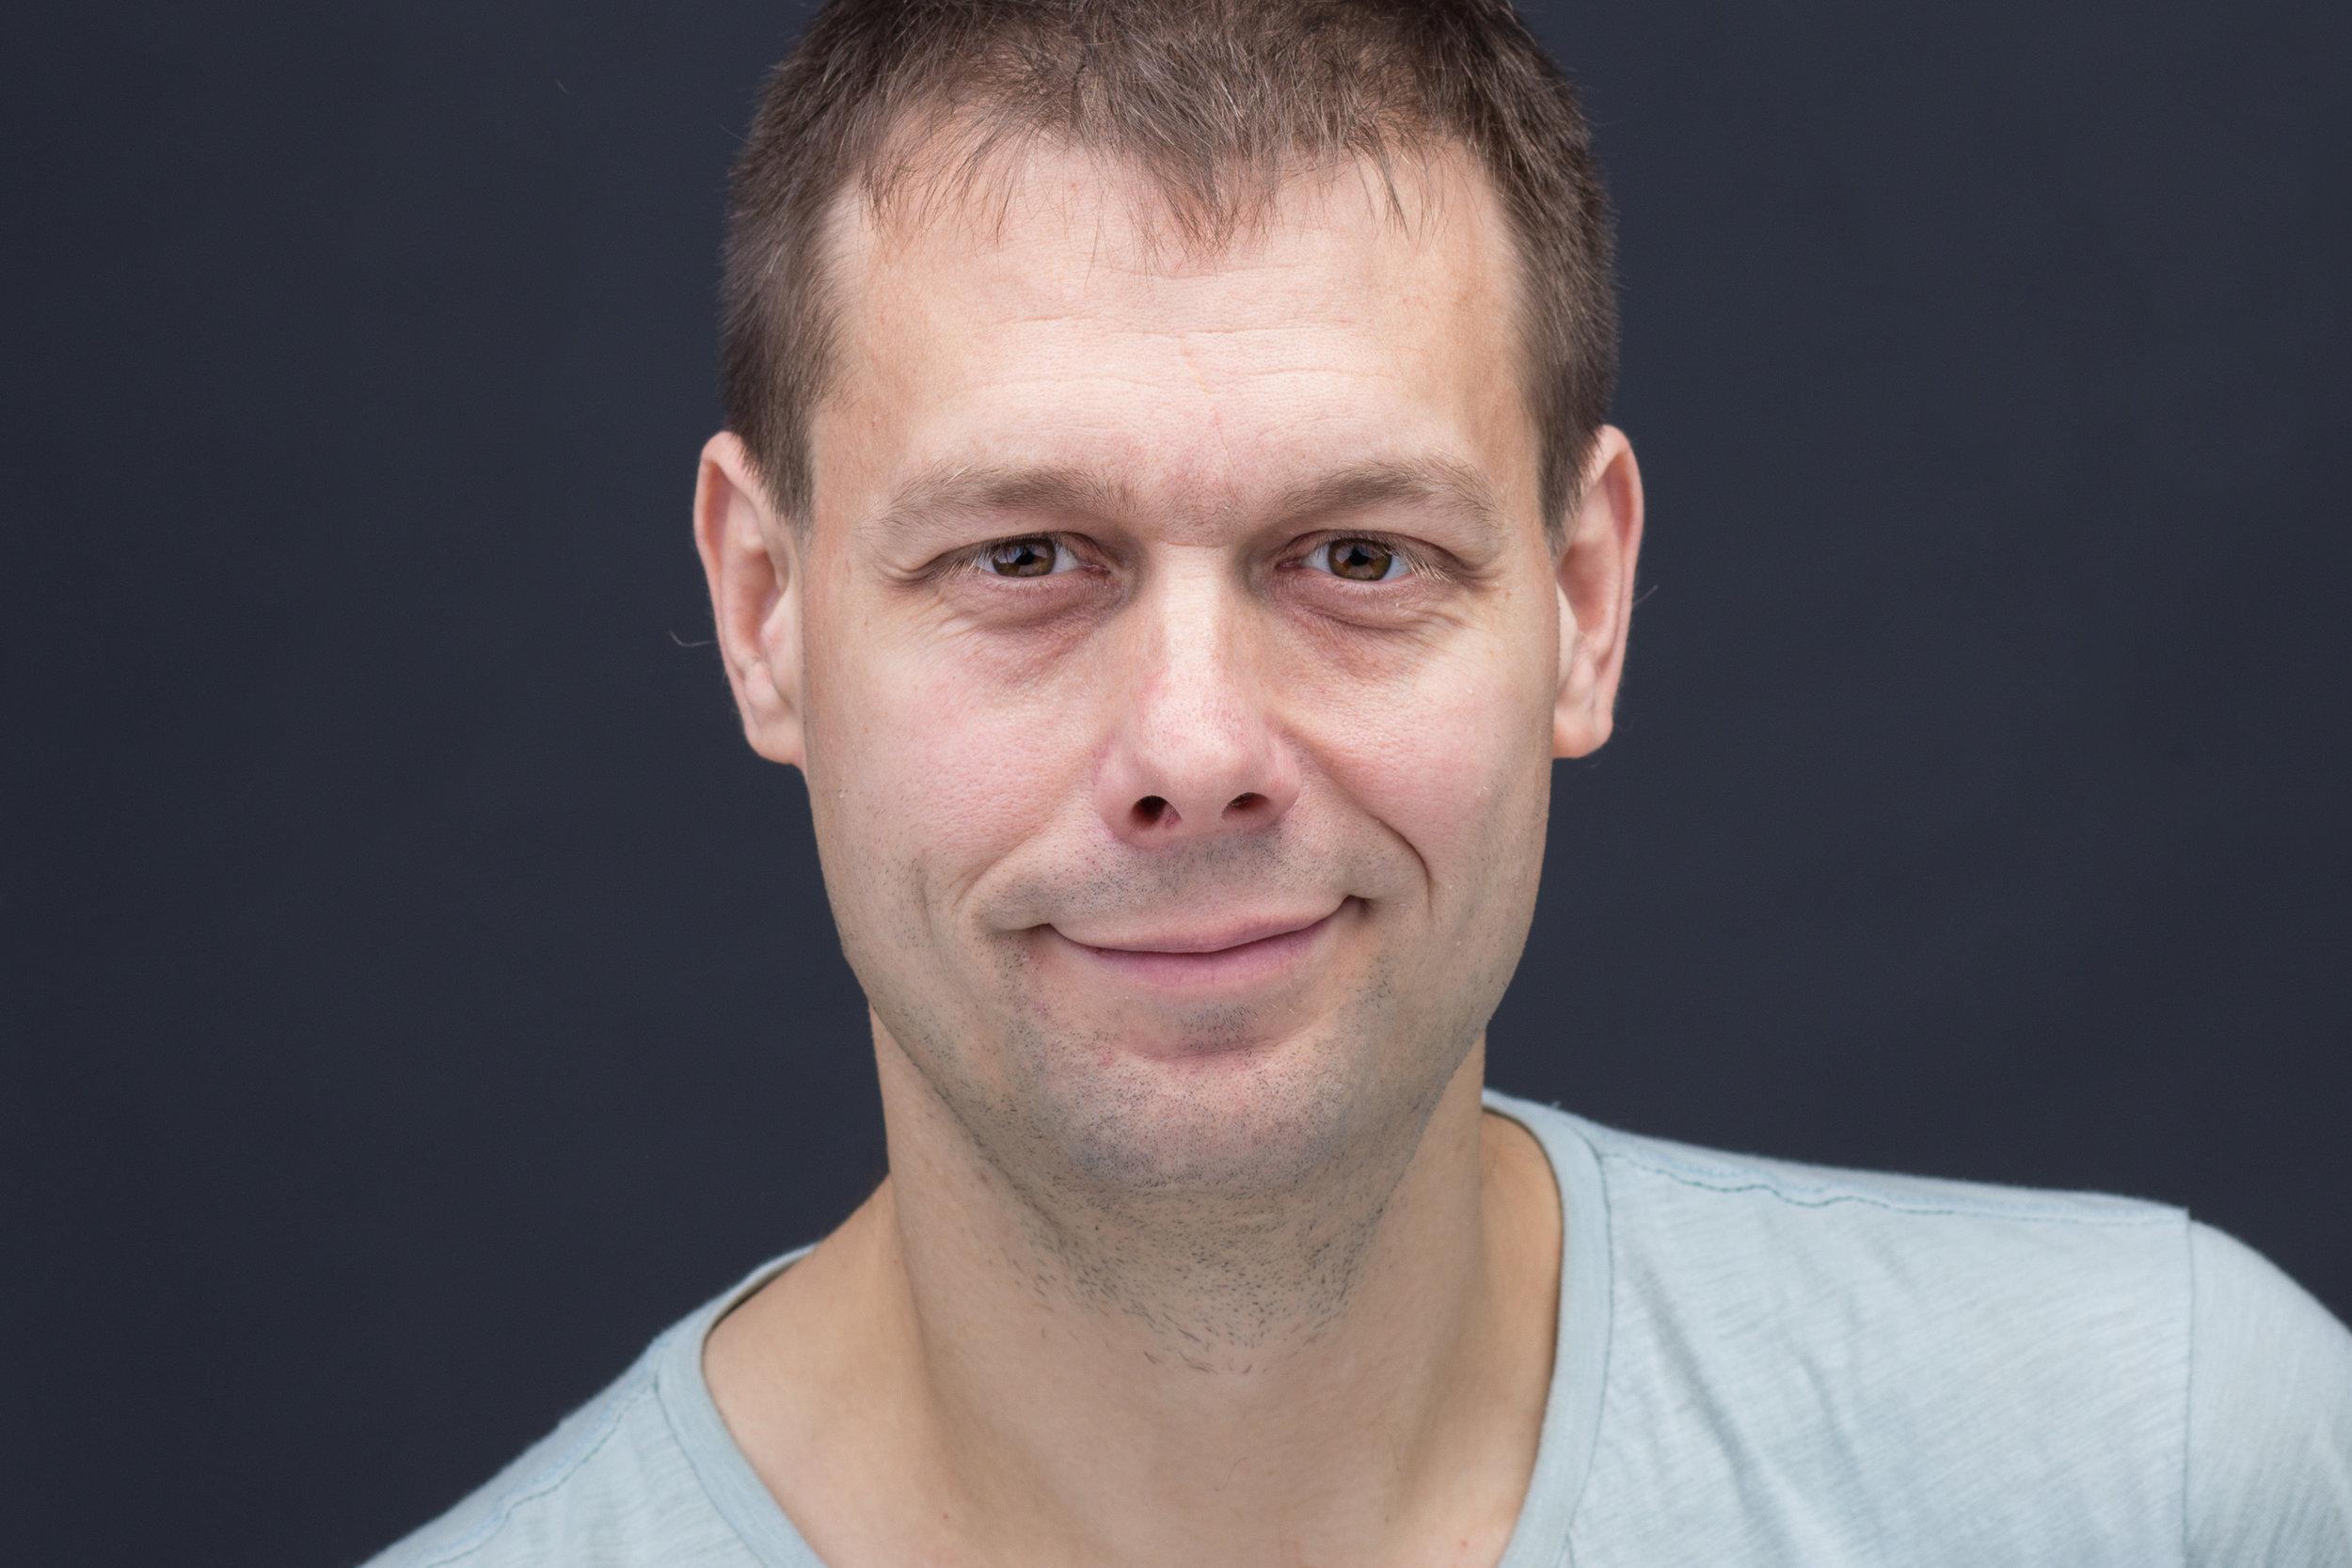 Mirko Schneider, (c)headshots-hamburg.com